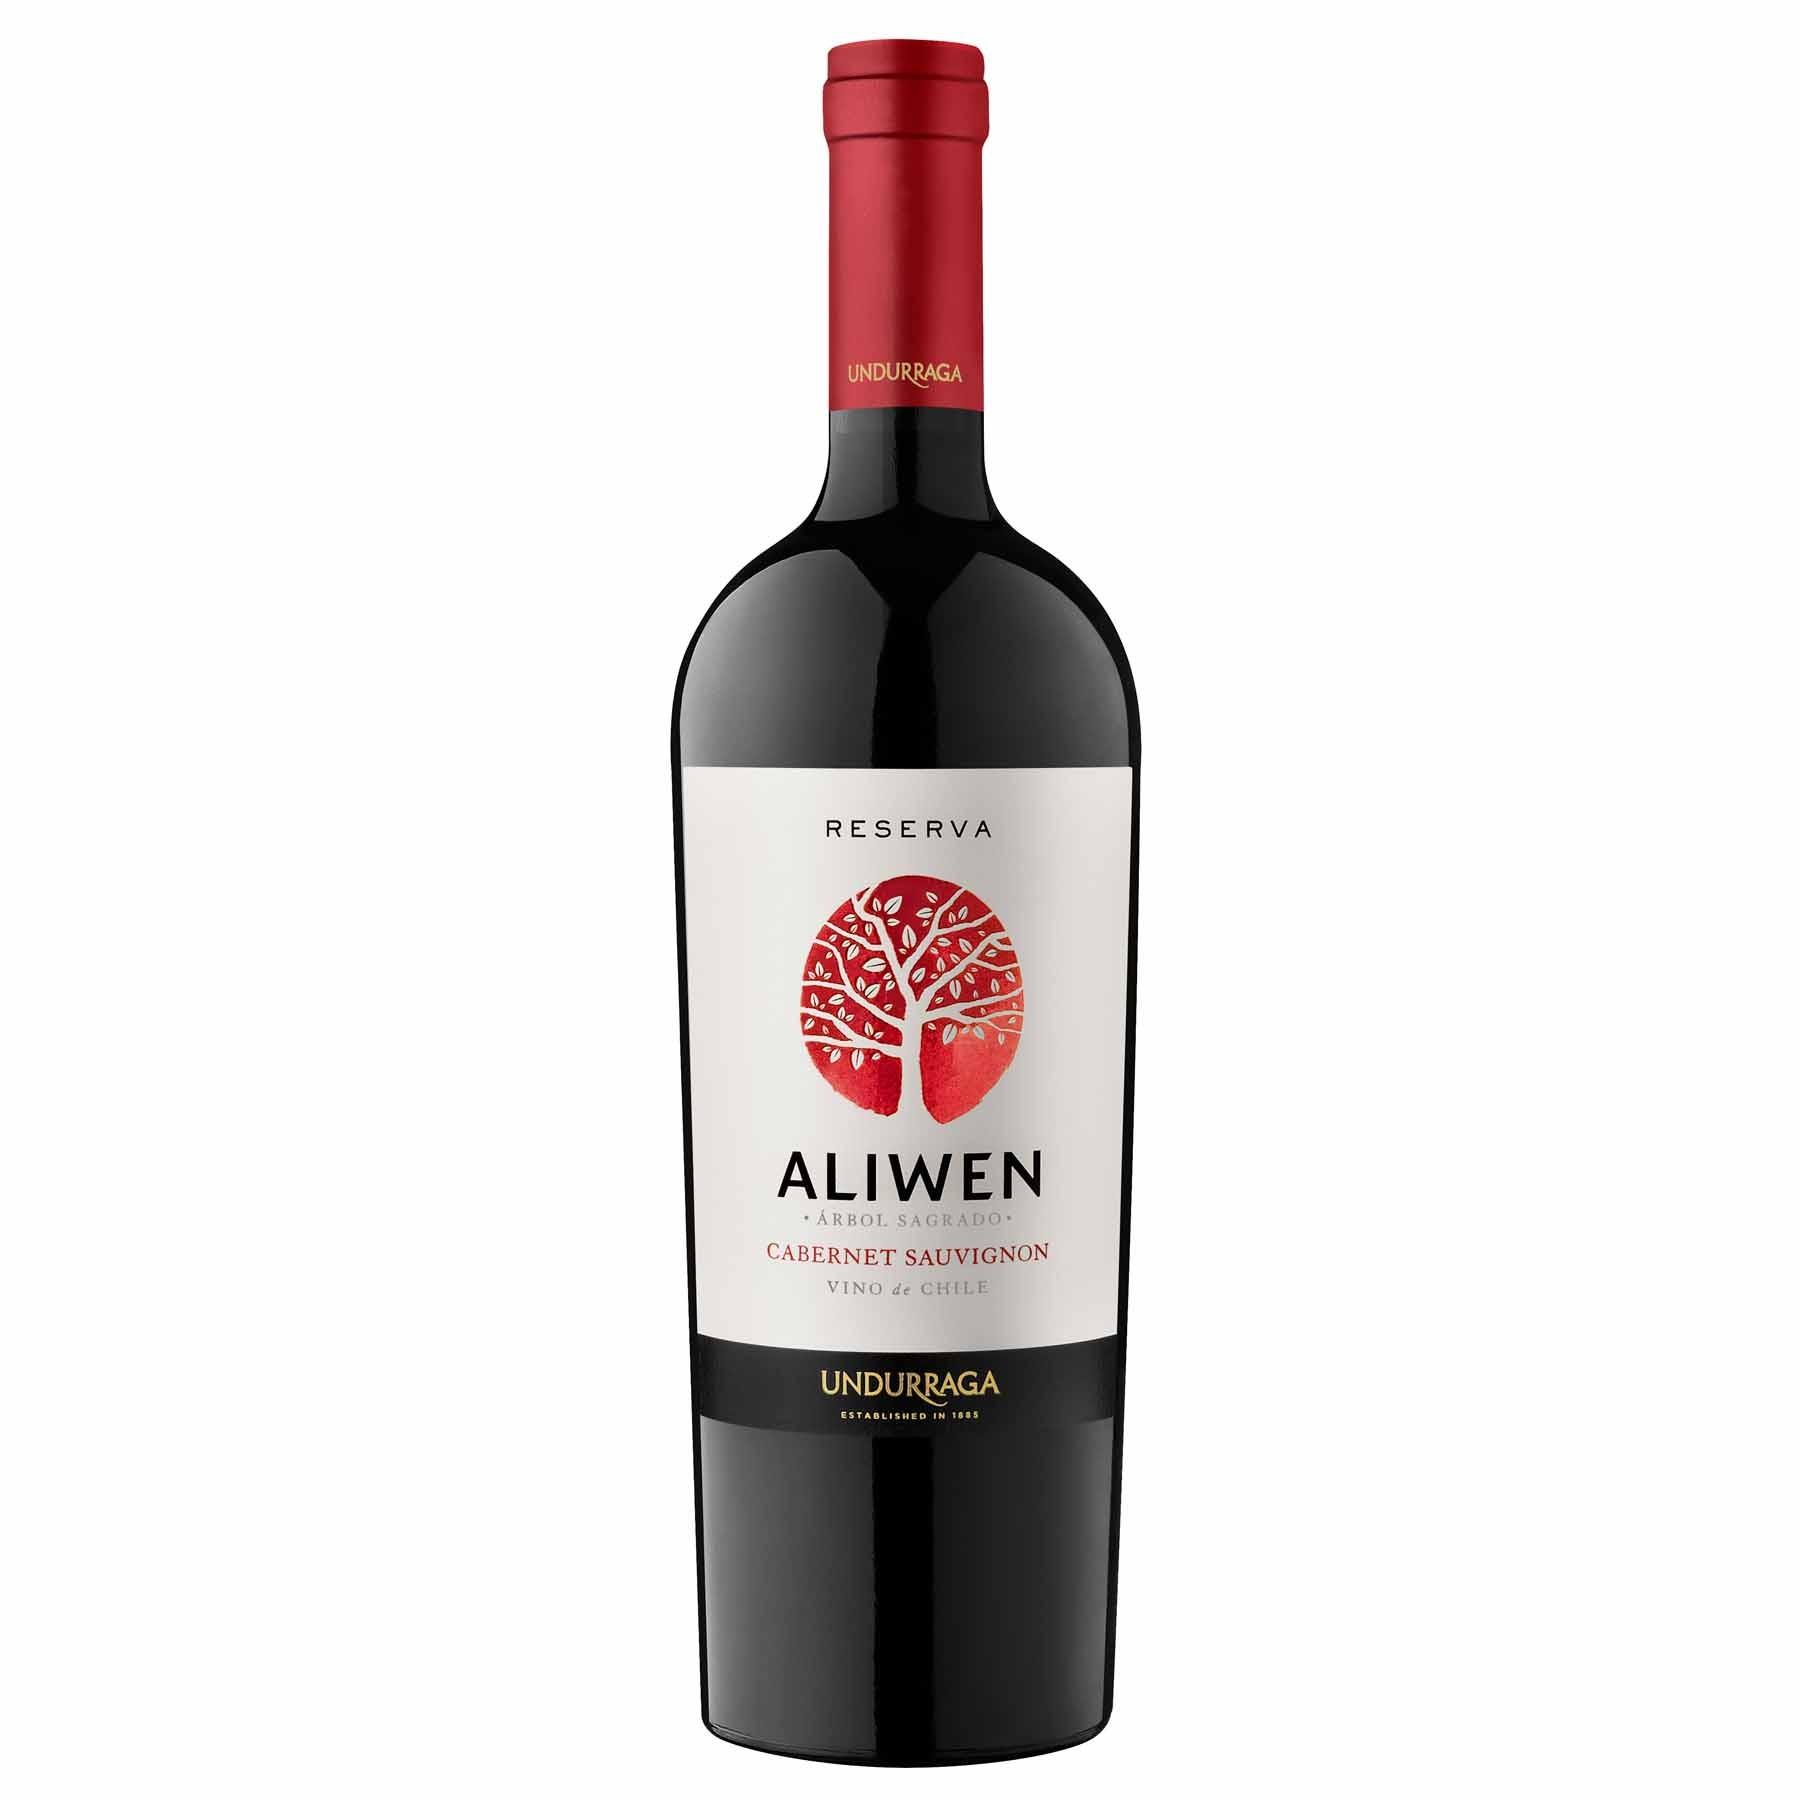 Vinho Tinto Chileno Undurraga Aliwen Reserva Cabernet Sauvignon 2014